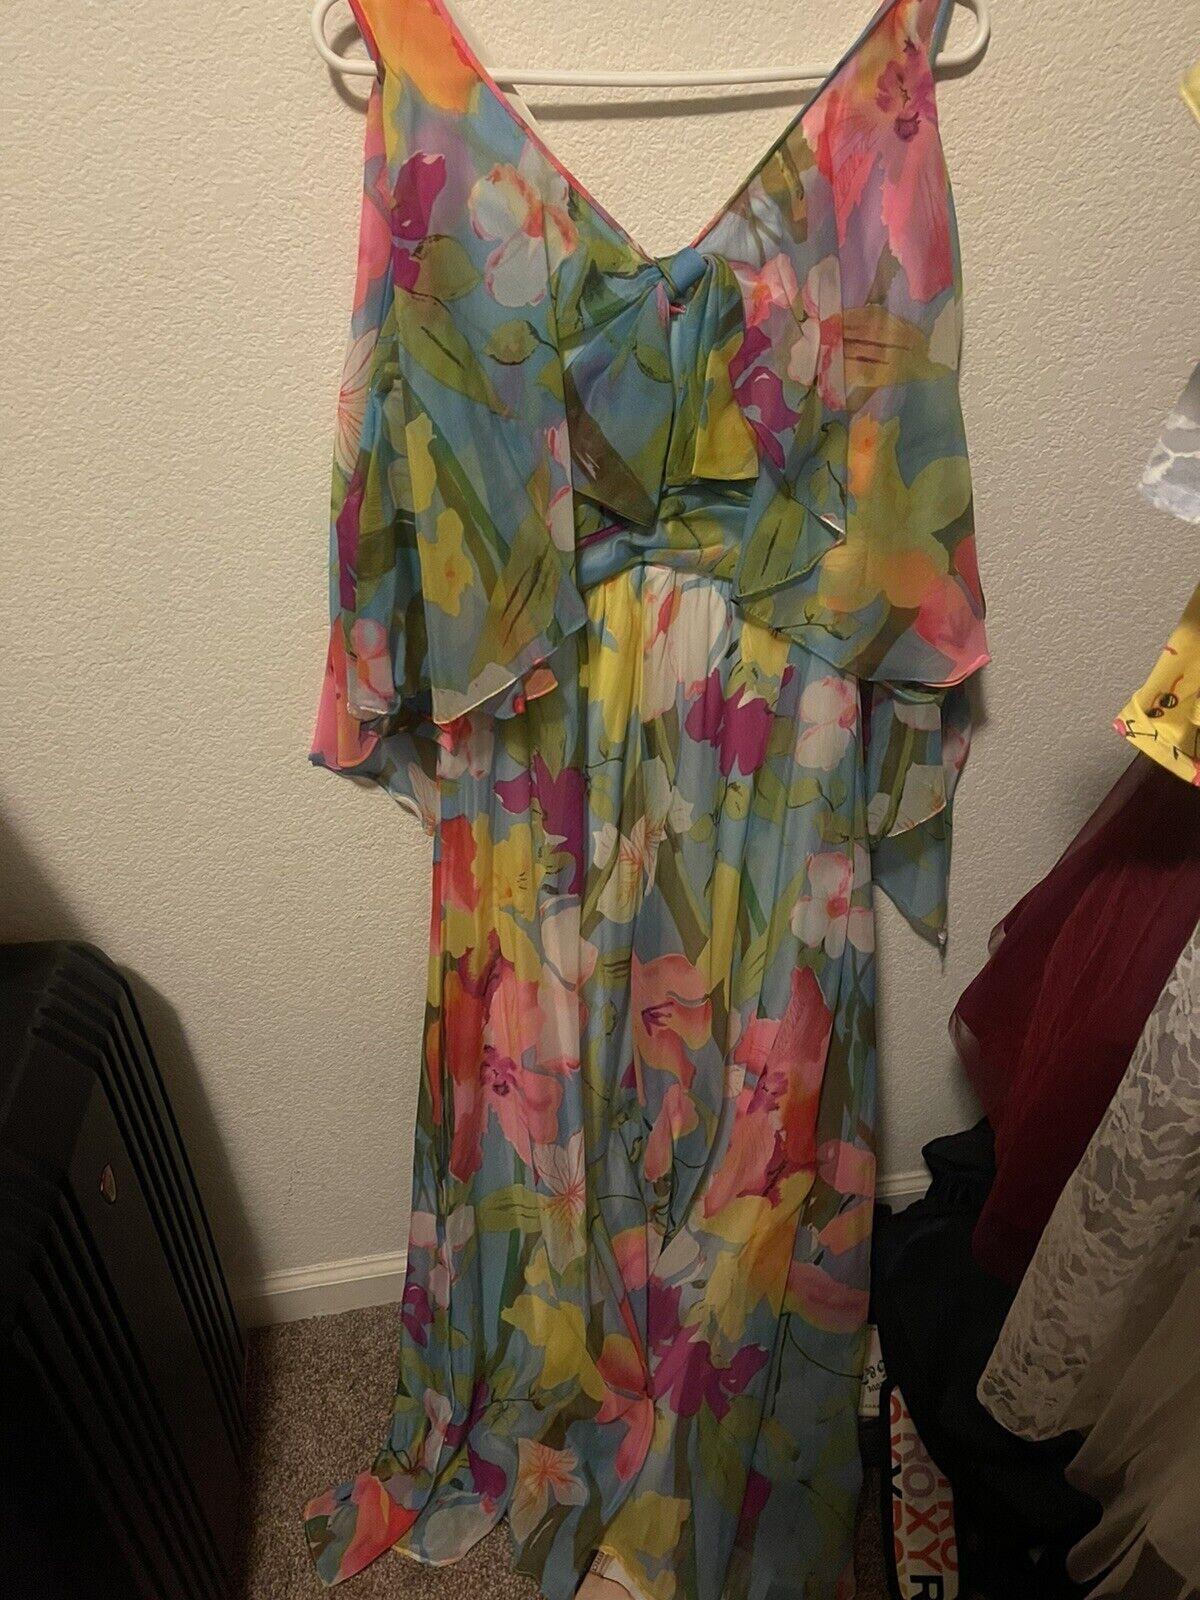 vintage dress lot 50s 60s 70s - image 1